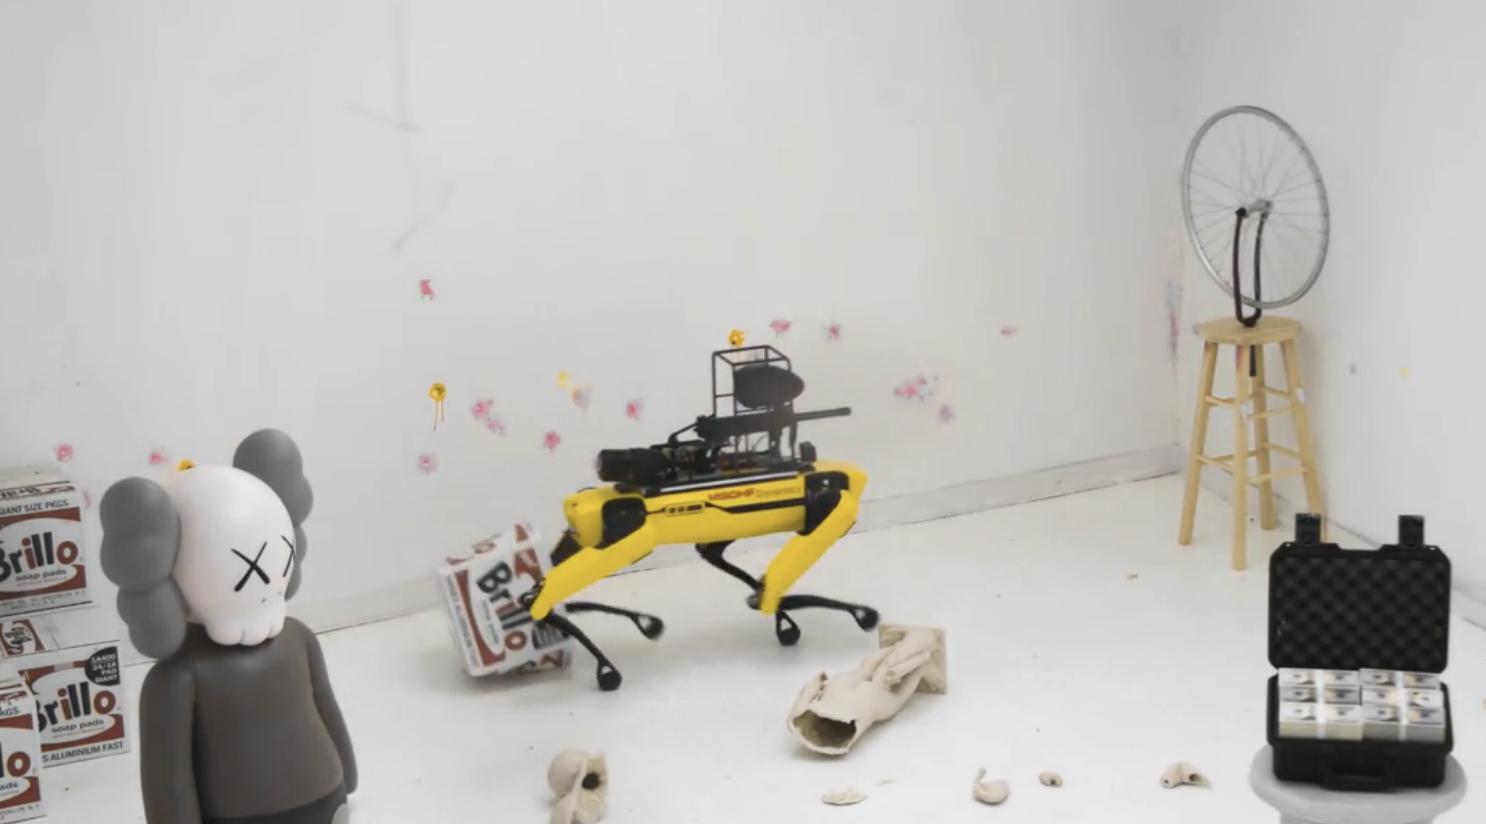 robot dog with paintball gun.